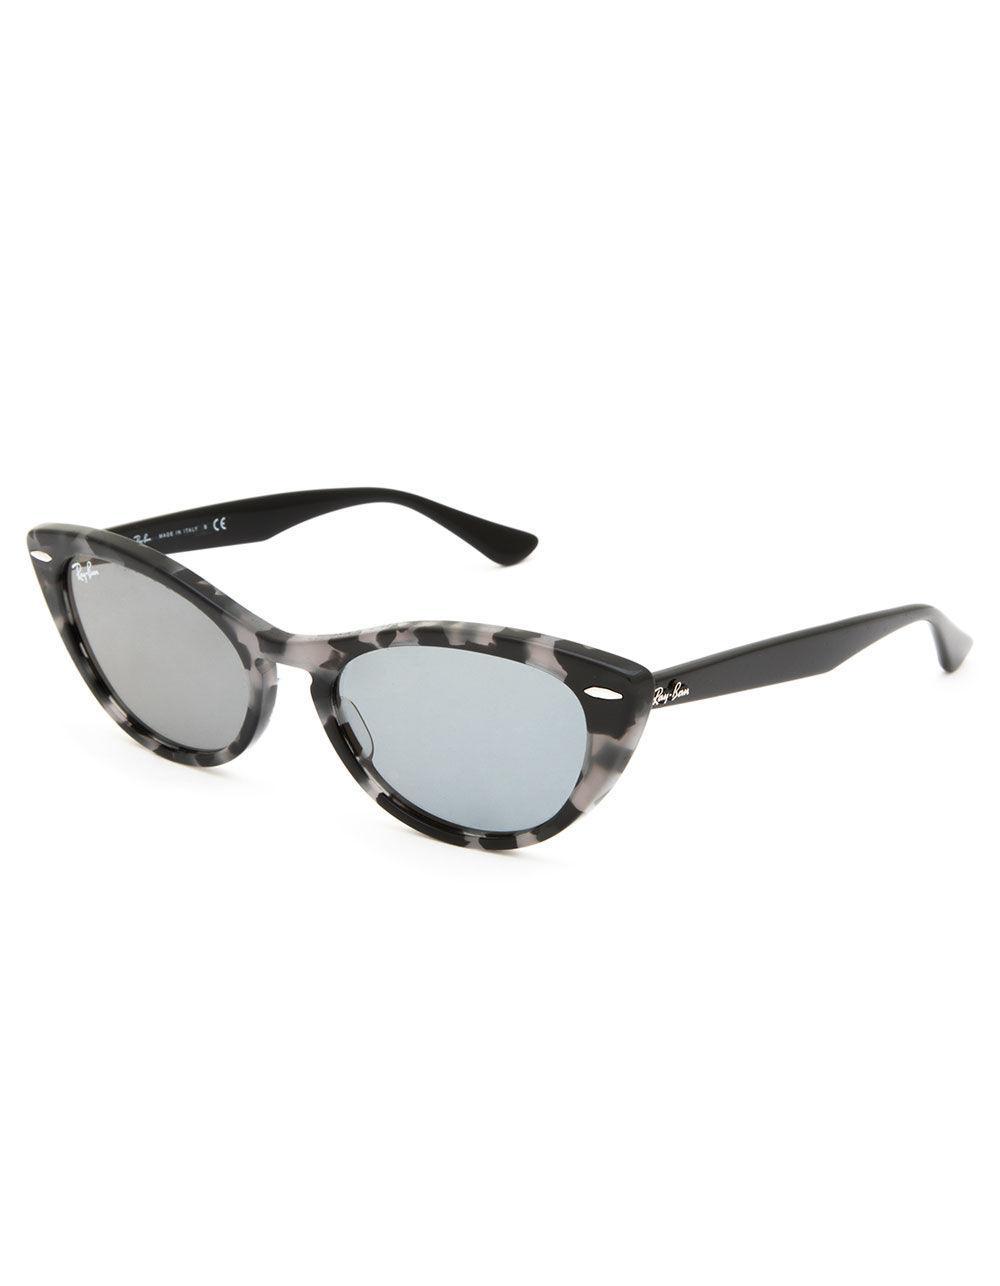 0f291b437e Lyst - Ray-Ban Nina Gray Havana   Black Sunglasses in Black